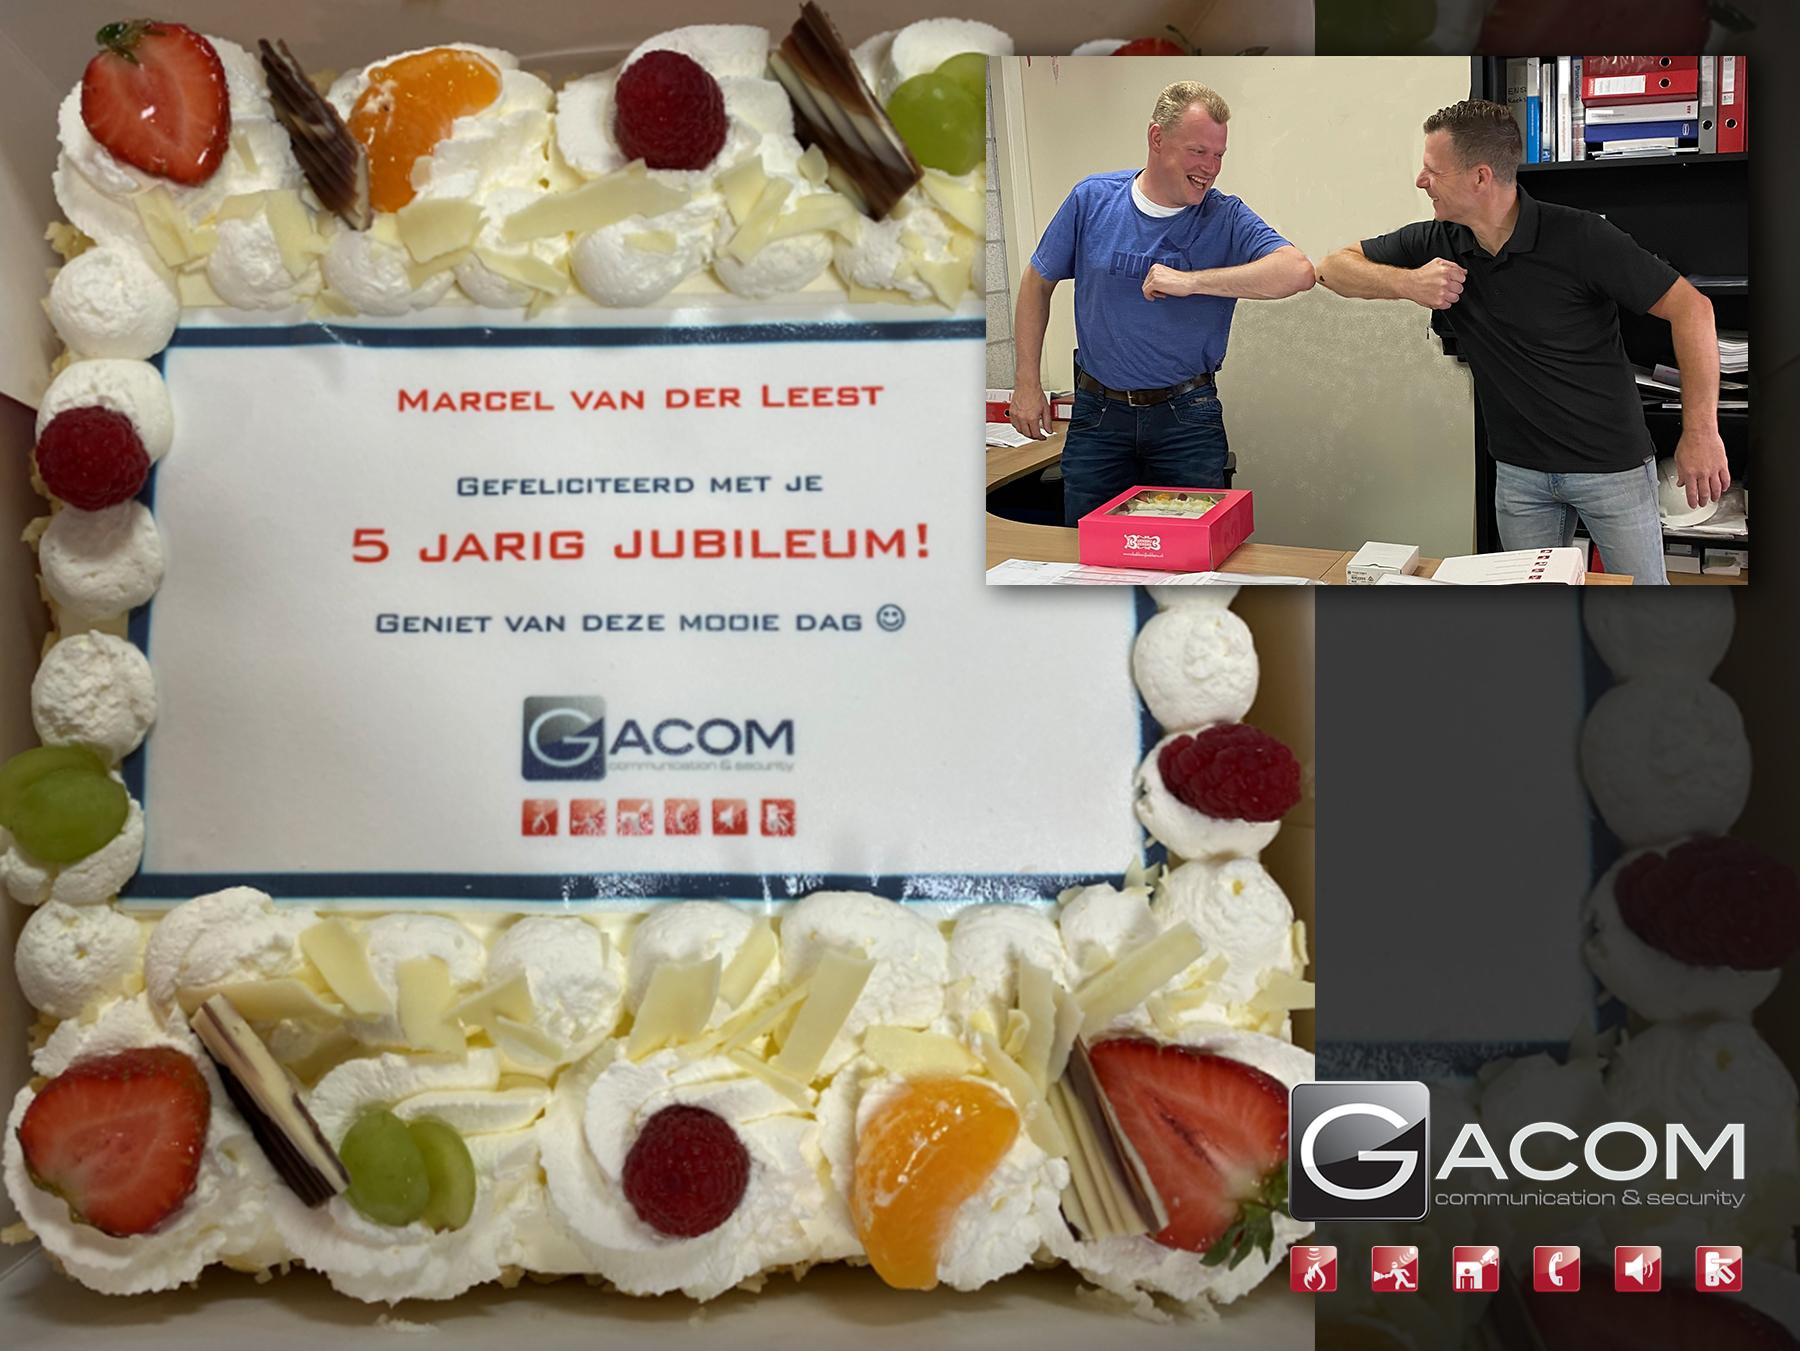 Gacom_Marcel van der Leest _5 jaar in dienst